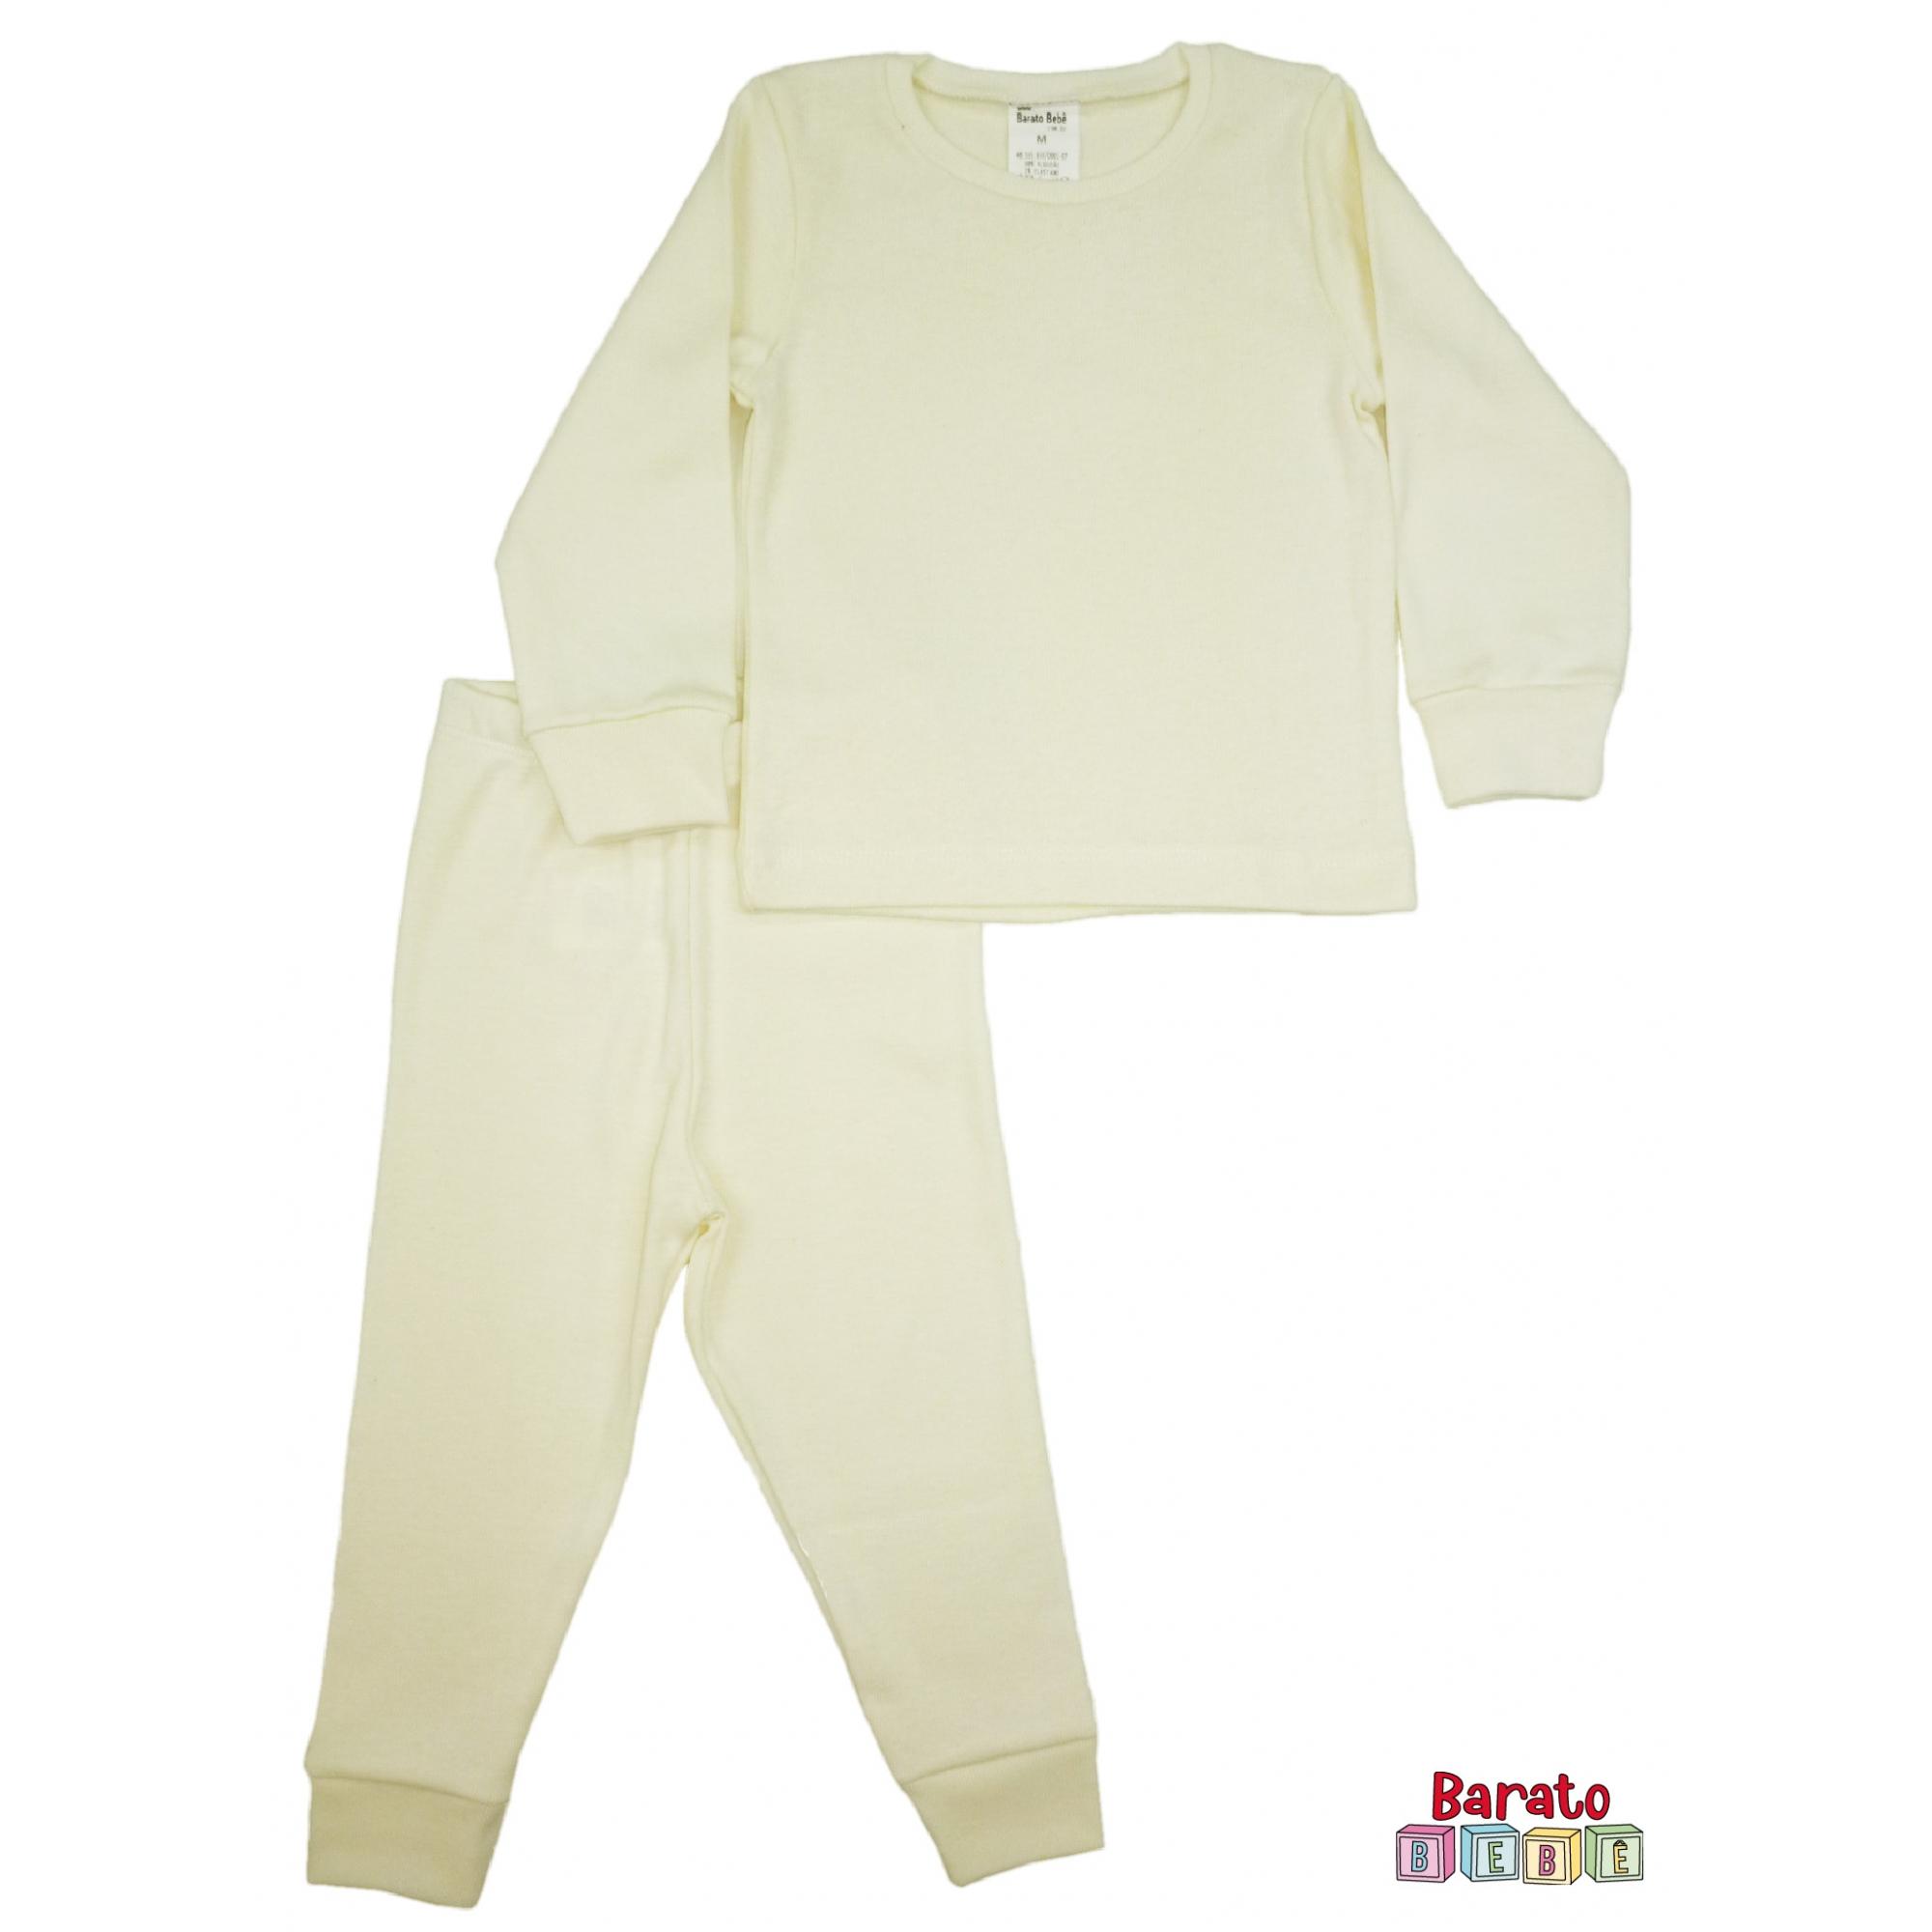 Conjunto Pijama Longo Bebê (P-M-G-GG)- Barato Bebê - Off White -Liso